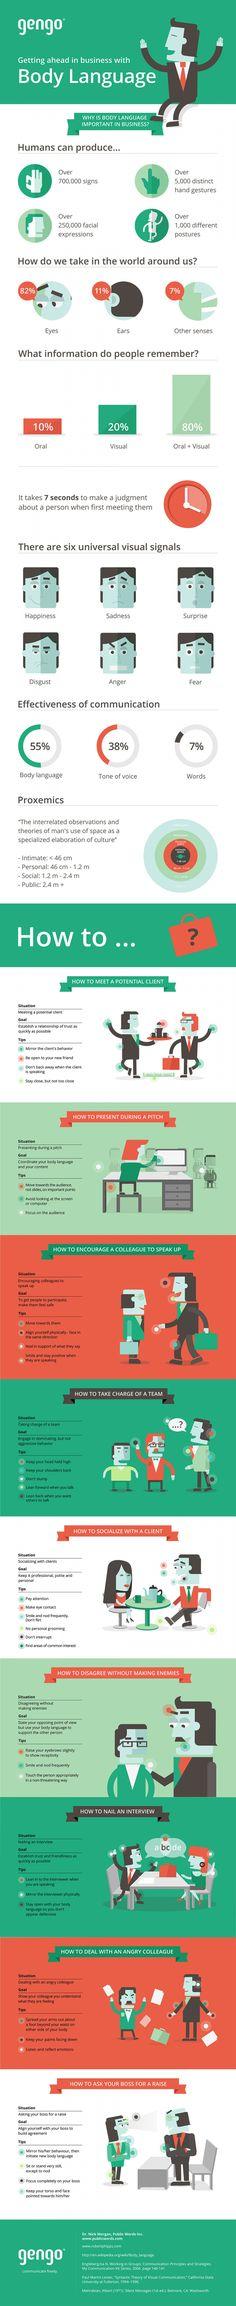 The Basics of Business Body Language #Infographic